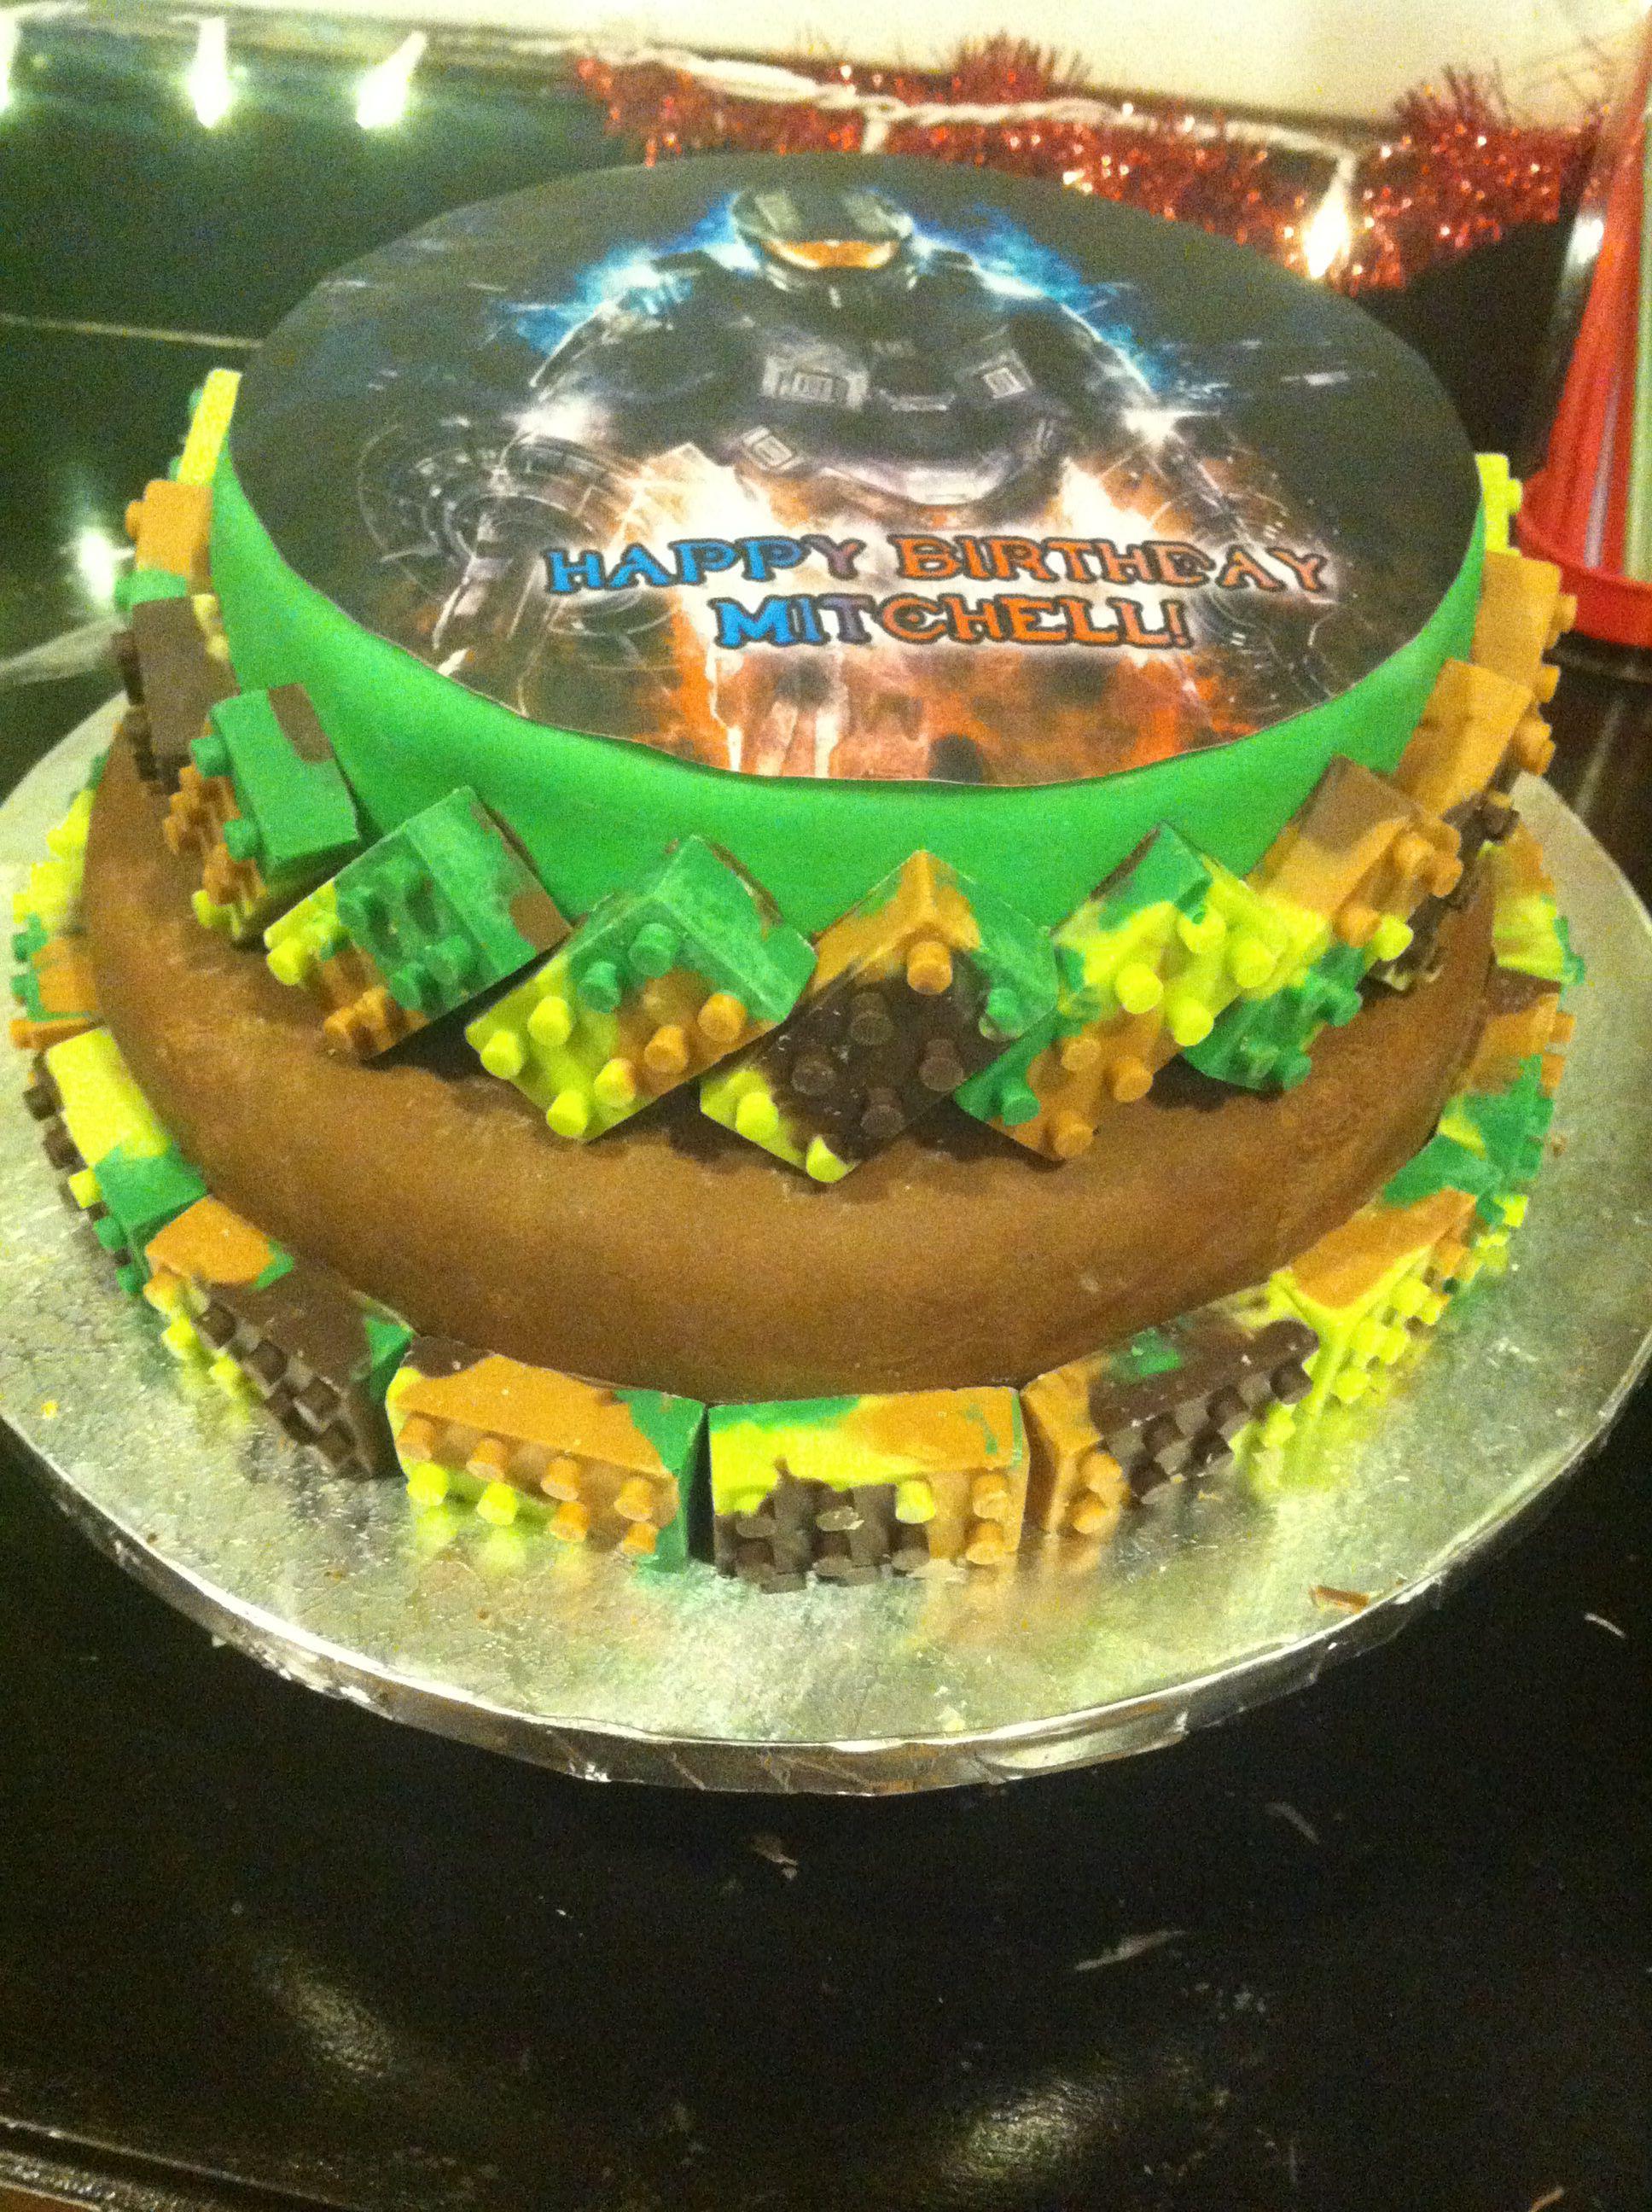 Marvelous Lego Camo Halo Birthday Cake Cakes By Eron Cake How To Make Cake Birthday Cards Printable Nowaargucafe Filternl